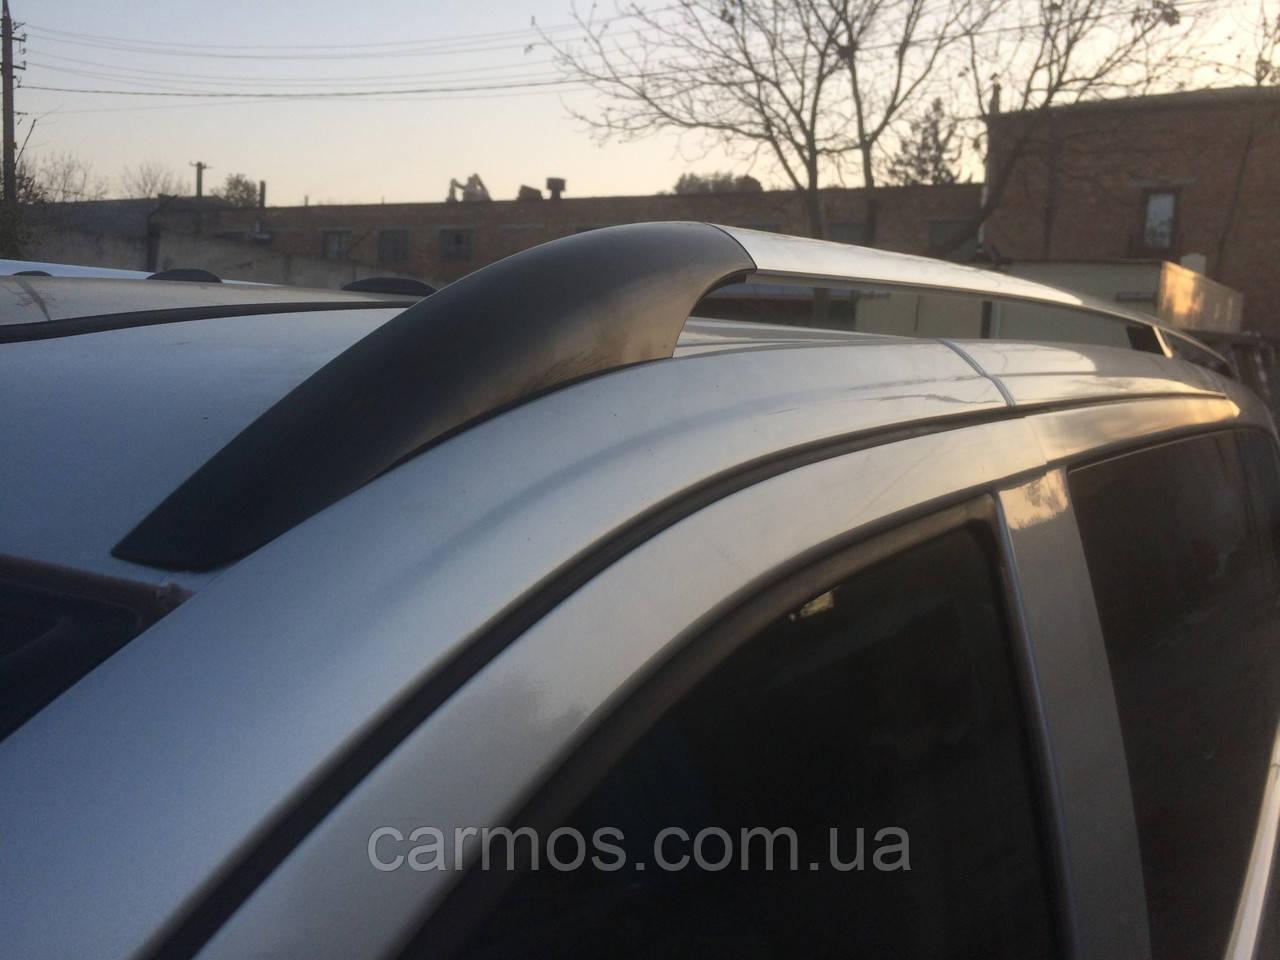 Рейлинги Mercedes Vito 639 (мерседес вито 639) ср.база, цвет Хром, крепление Abs